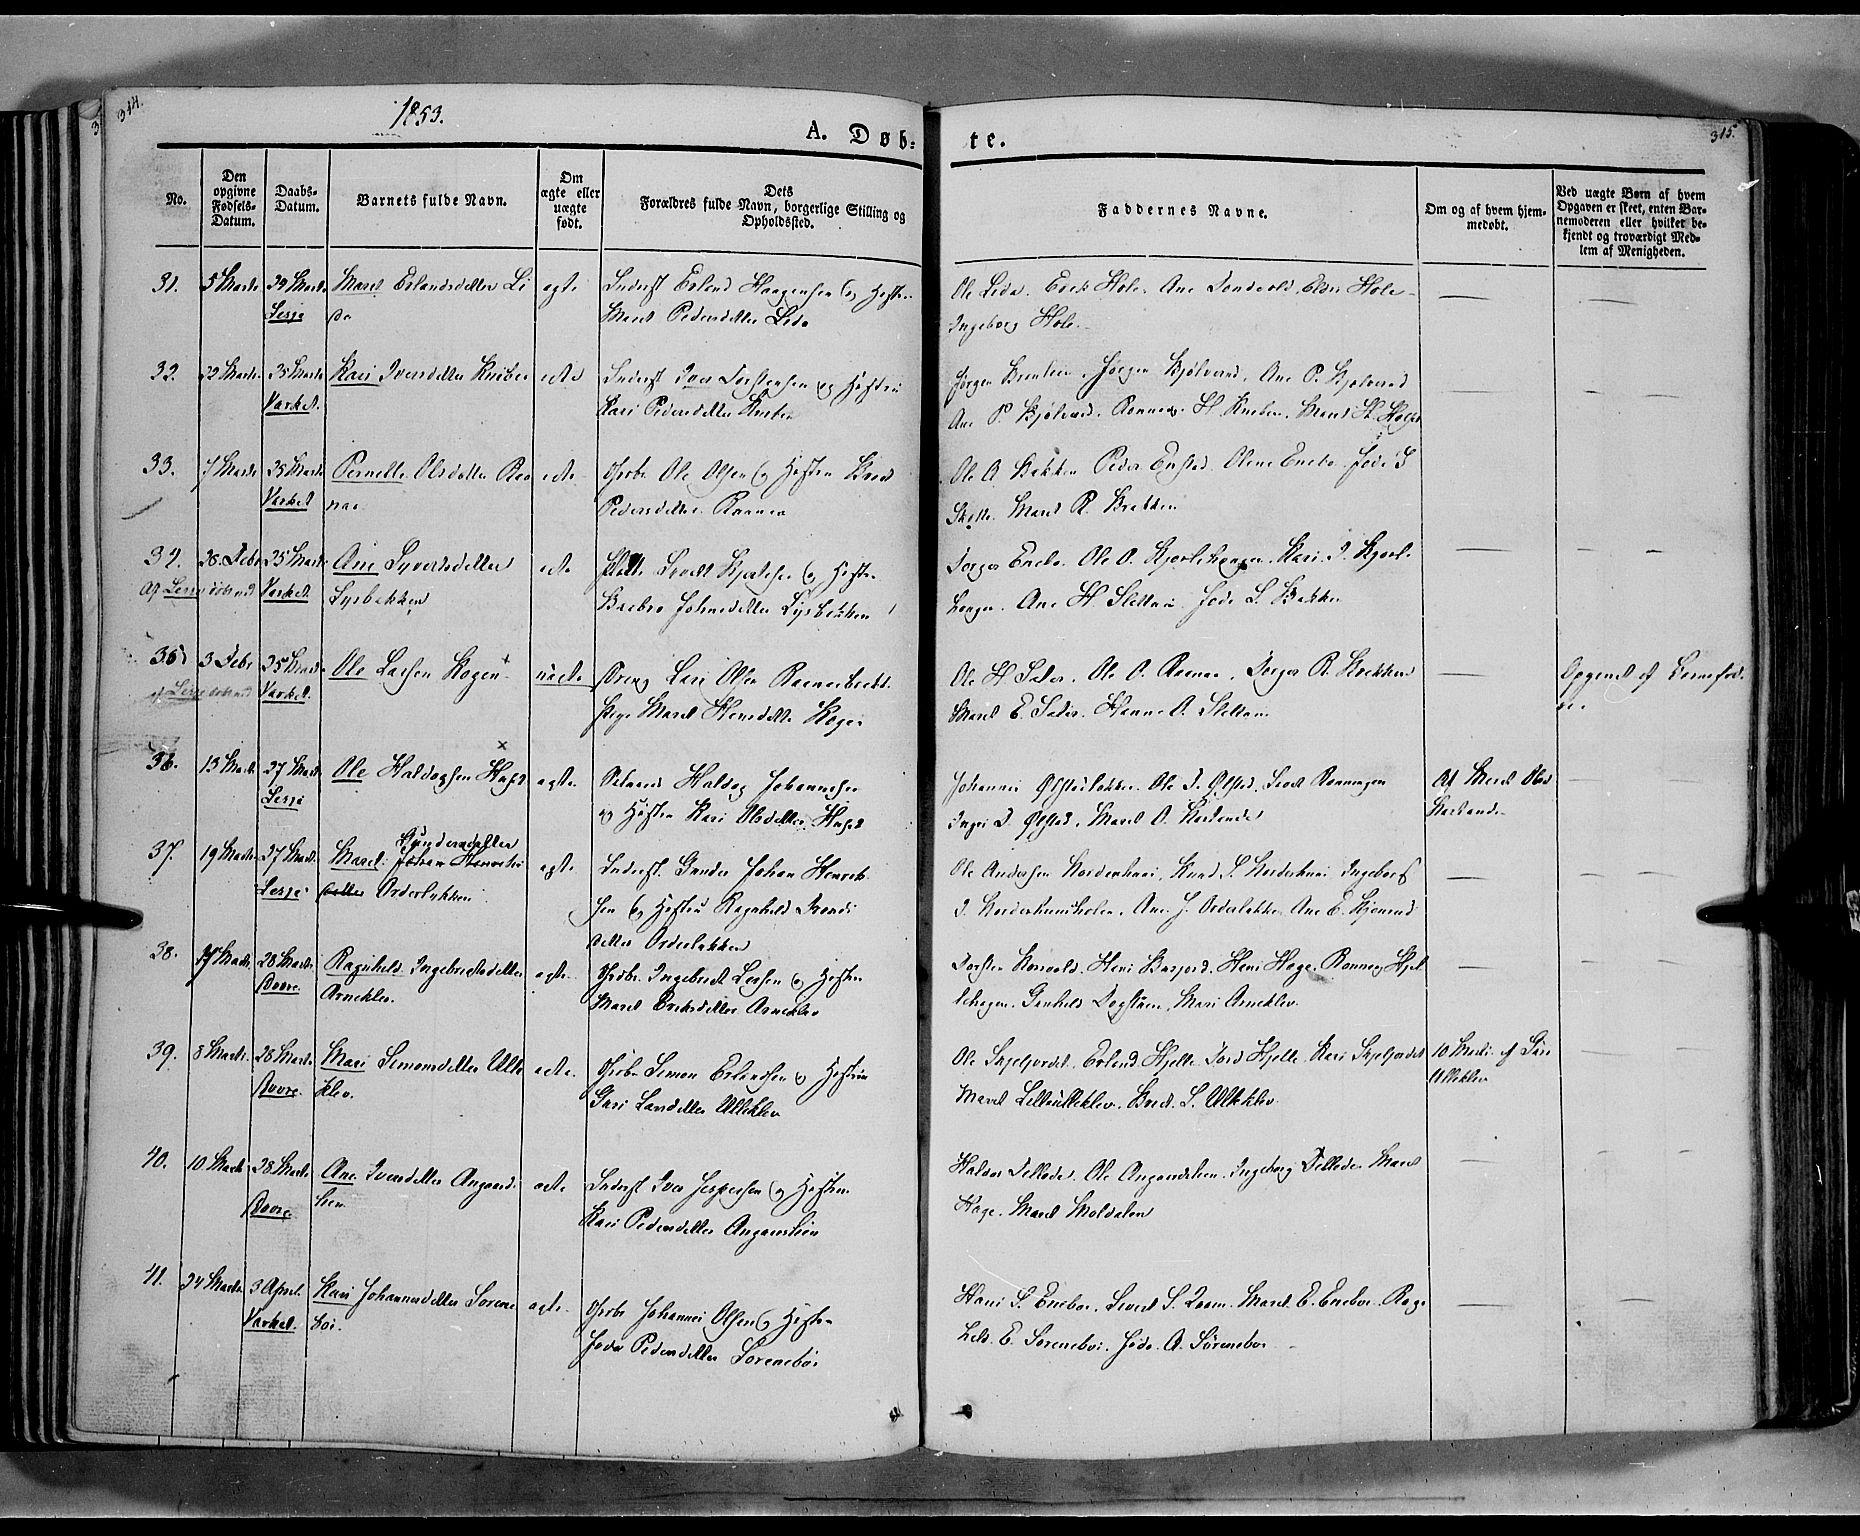 SAH, Lesja prestekontor, Ministerialbok nr. 6A, 1843-1854, s. 314-315